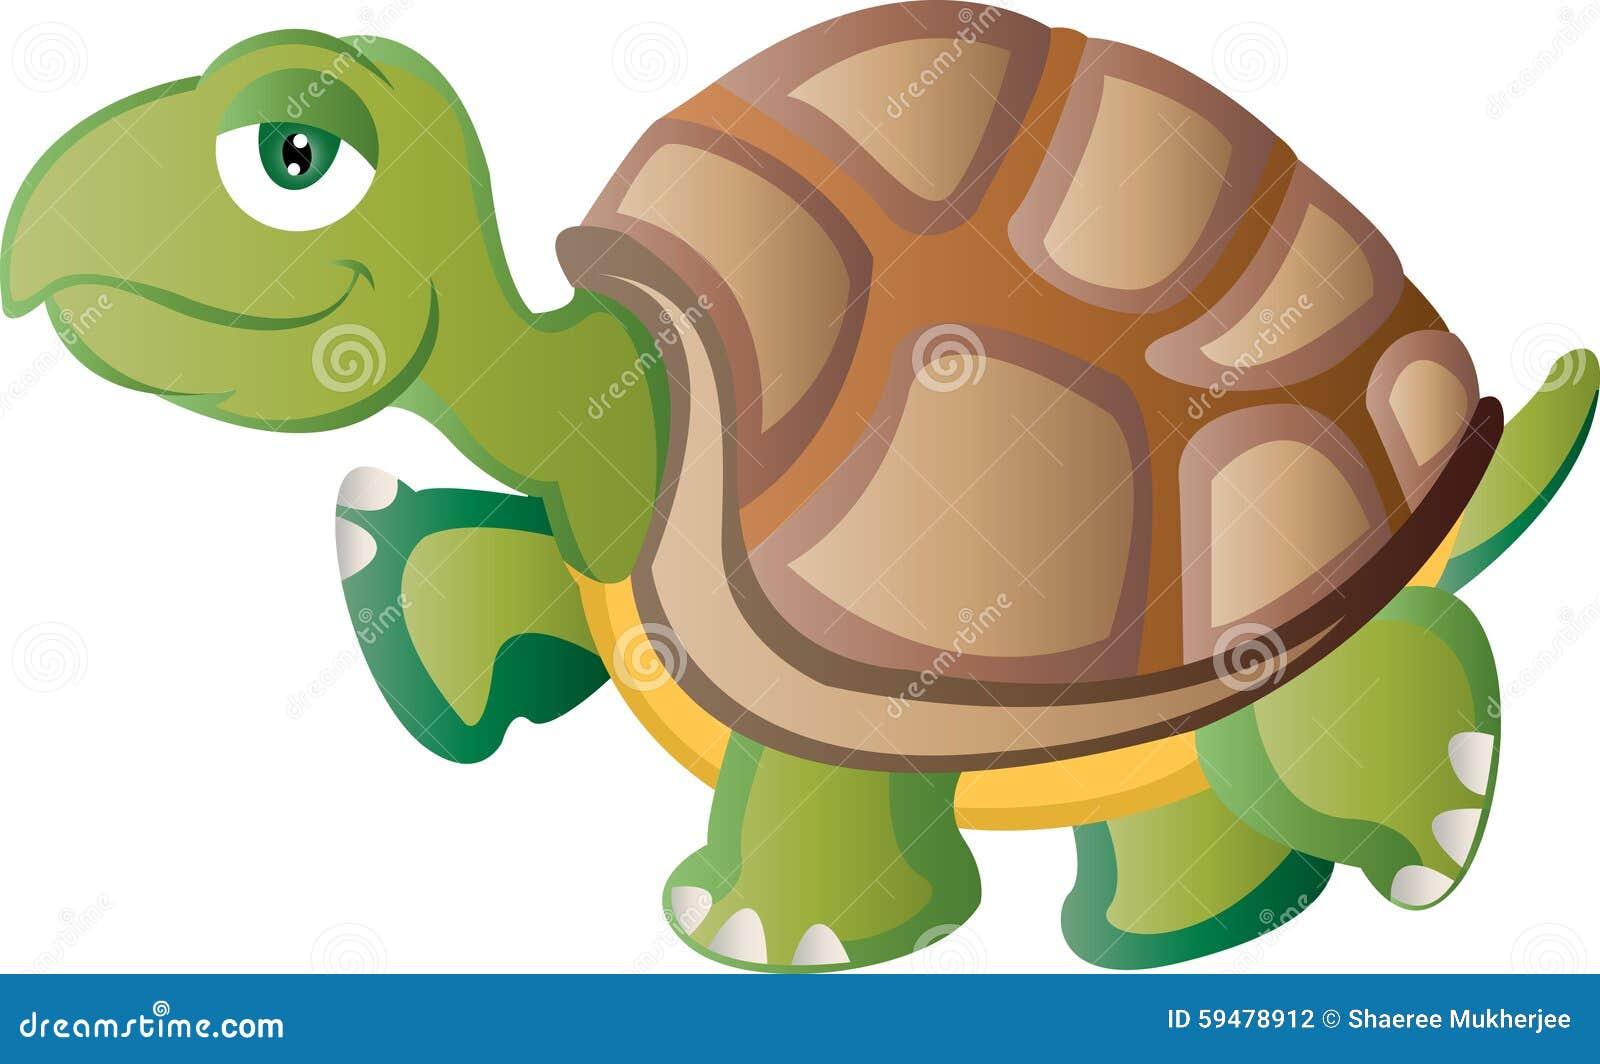 cartoon tortoise stock vector illustration of tortoise 59478912 rh dreamstime com Hare Clip Art Cartoon Tortoise